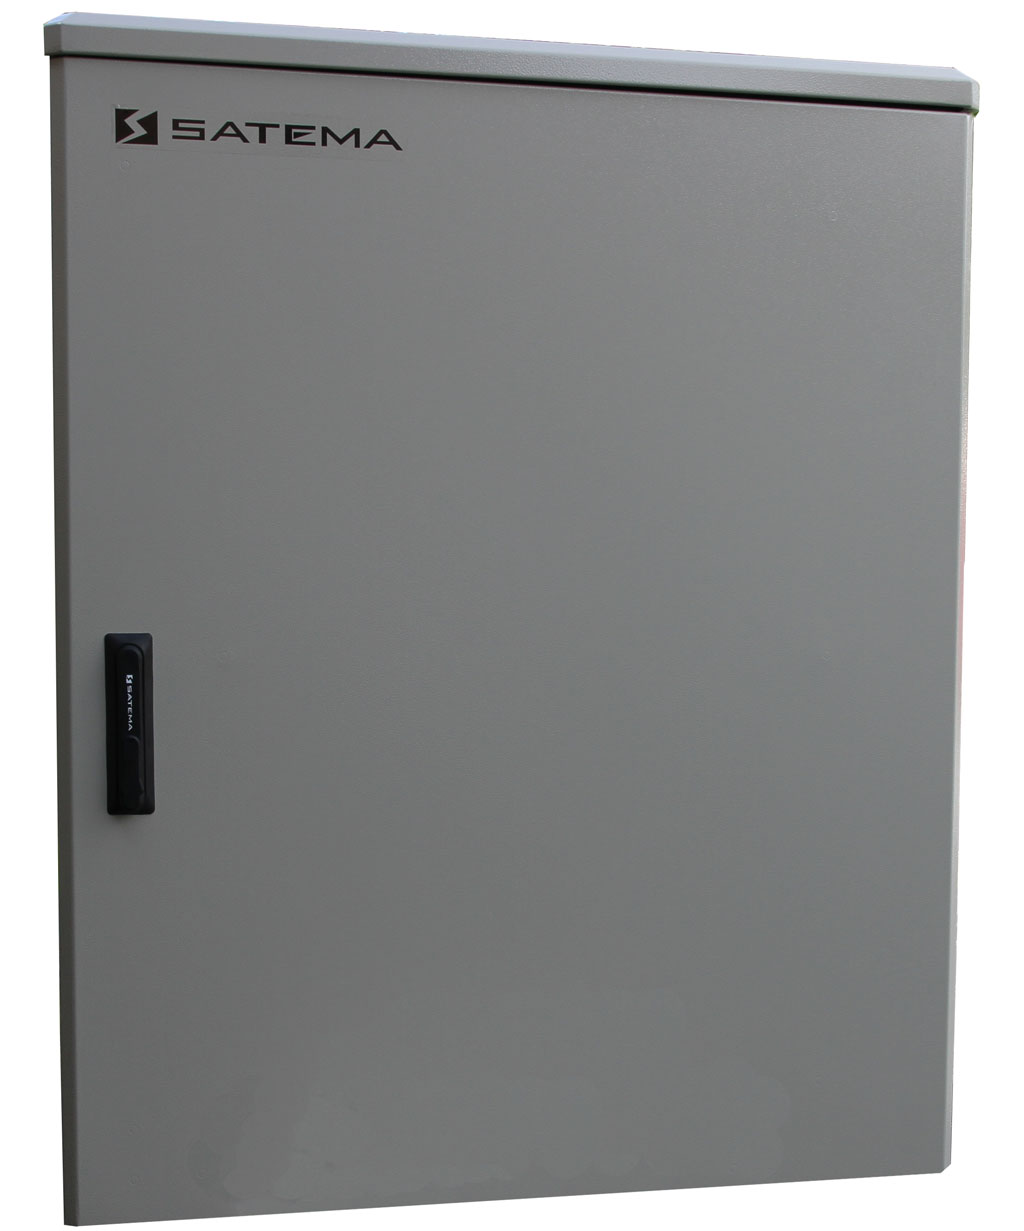 Dubbelvaggiga-Aluminiumskap-1000x1600x400